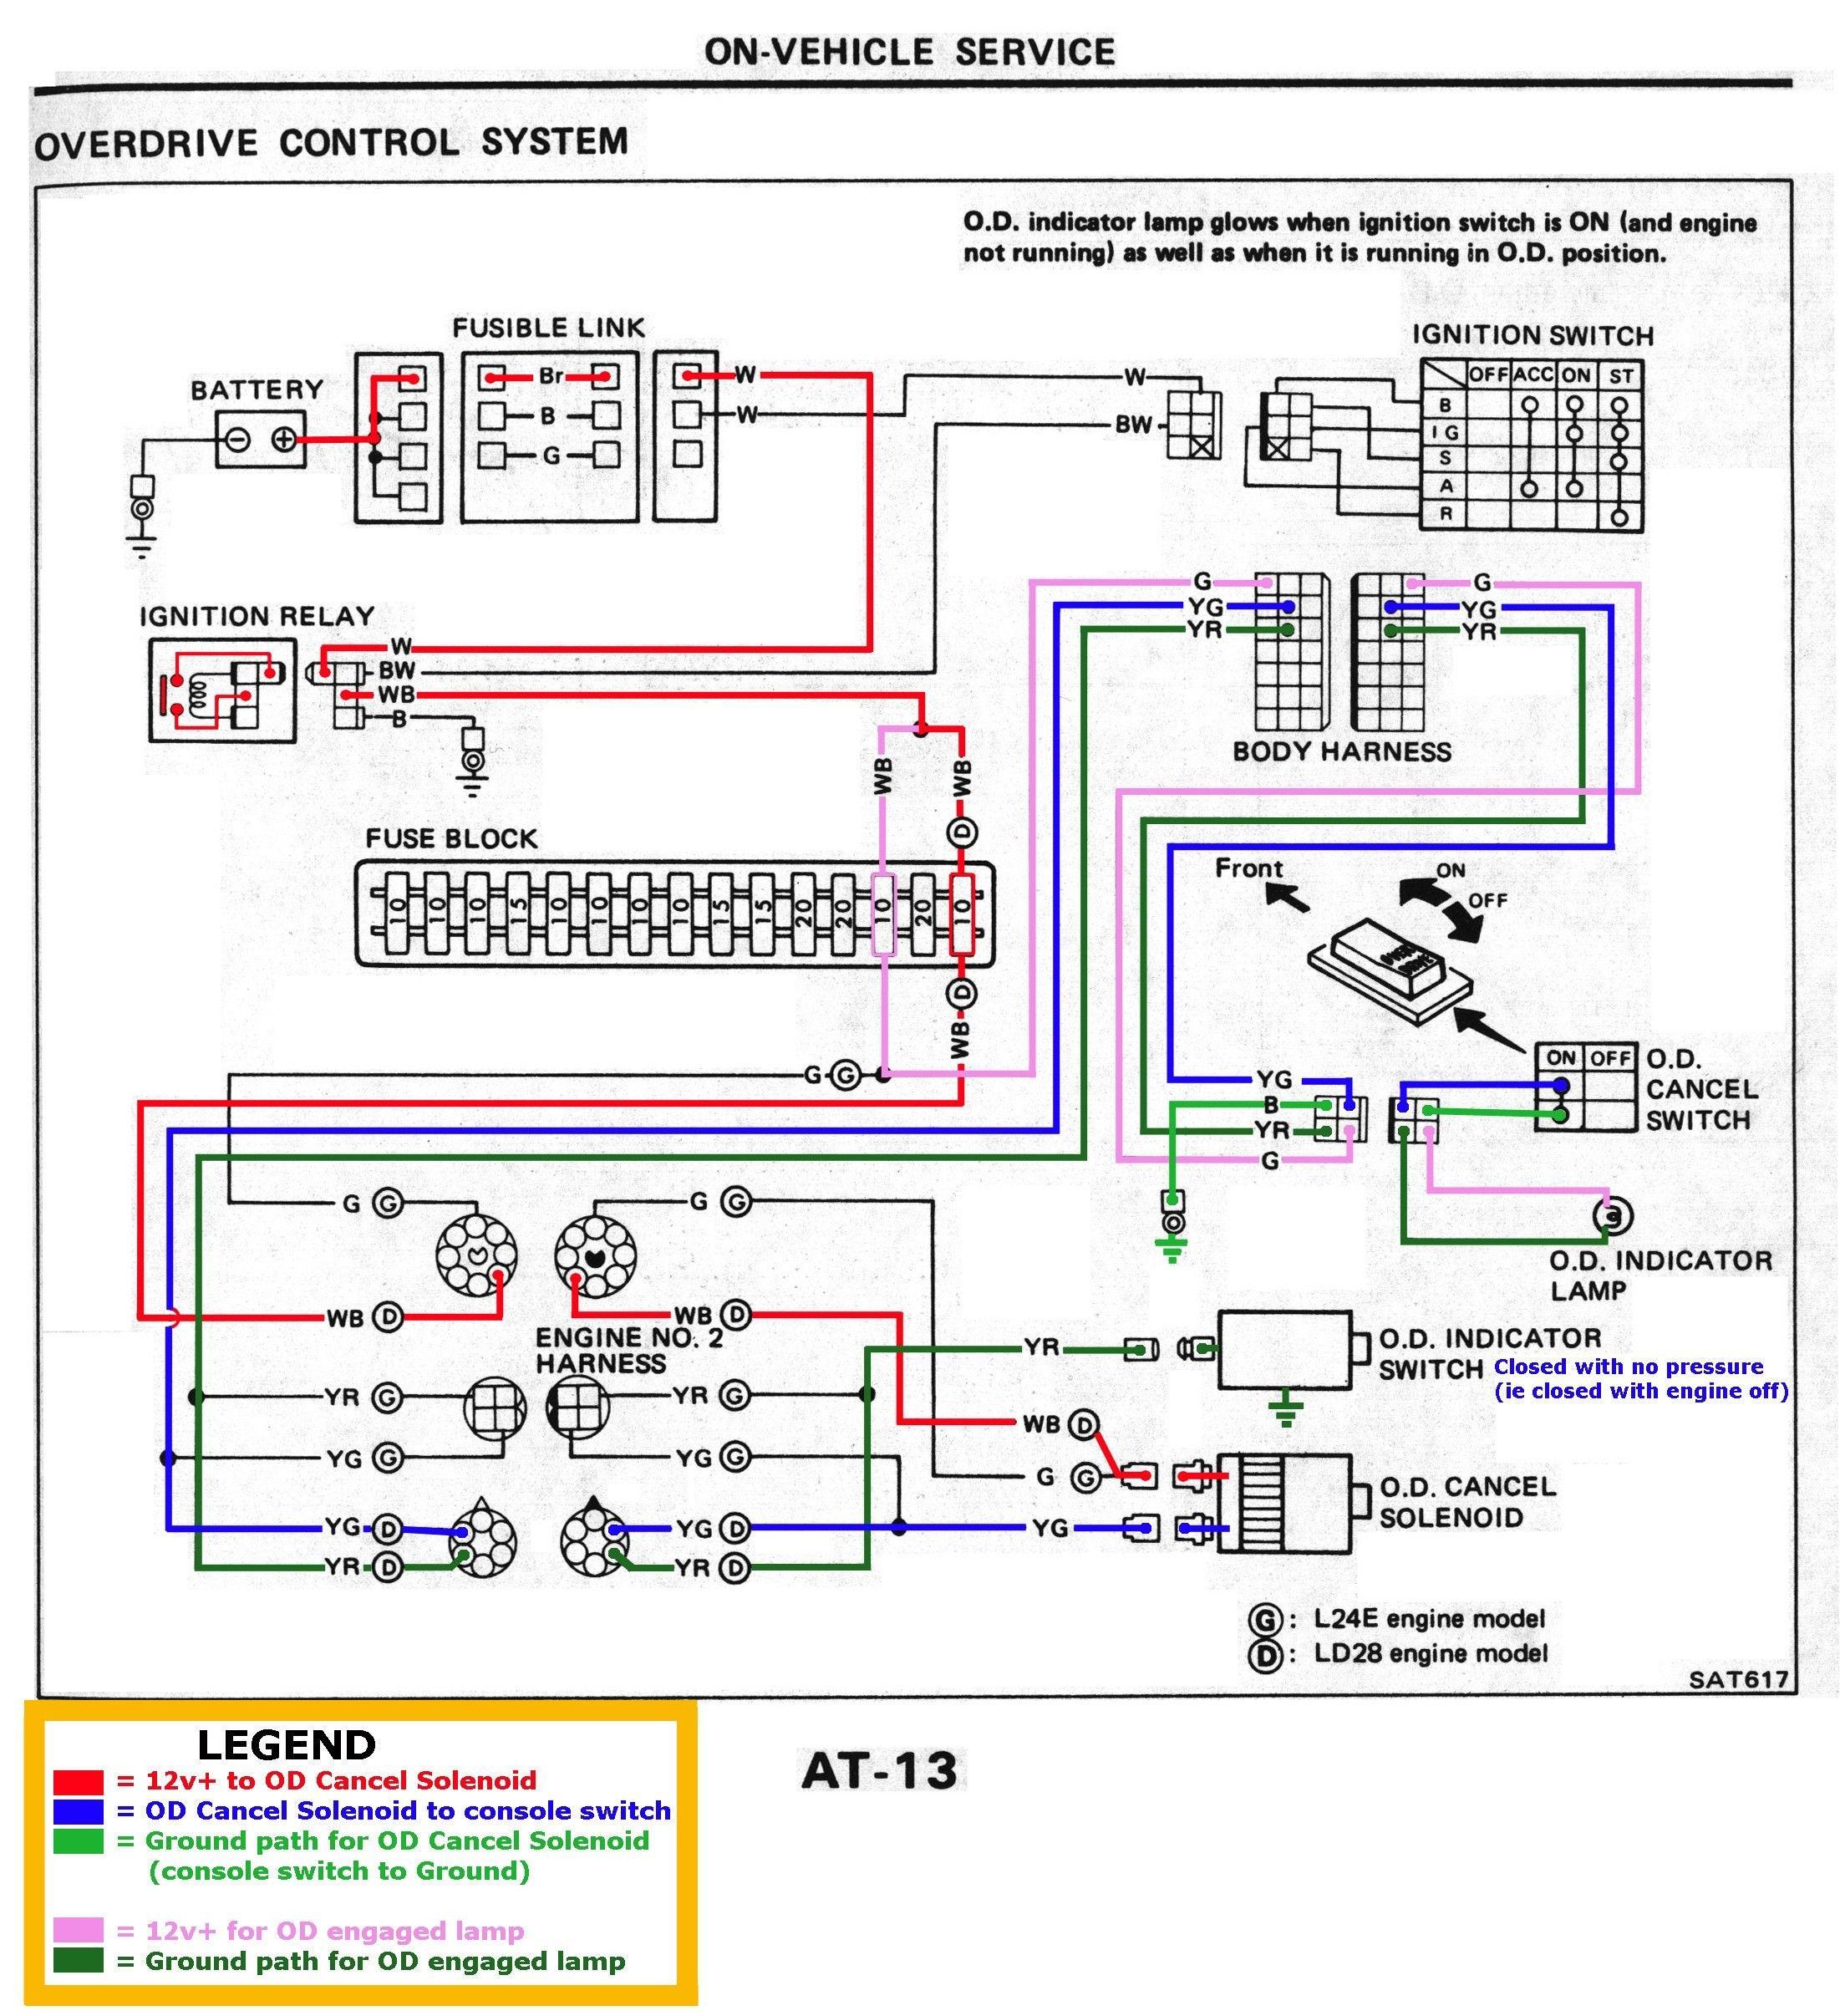 New Dirt Car Wiring Diagram Electrical Wiring Diagram Trailer Wiring Diagram House Wiring